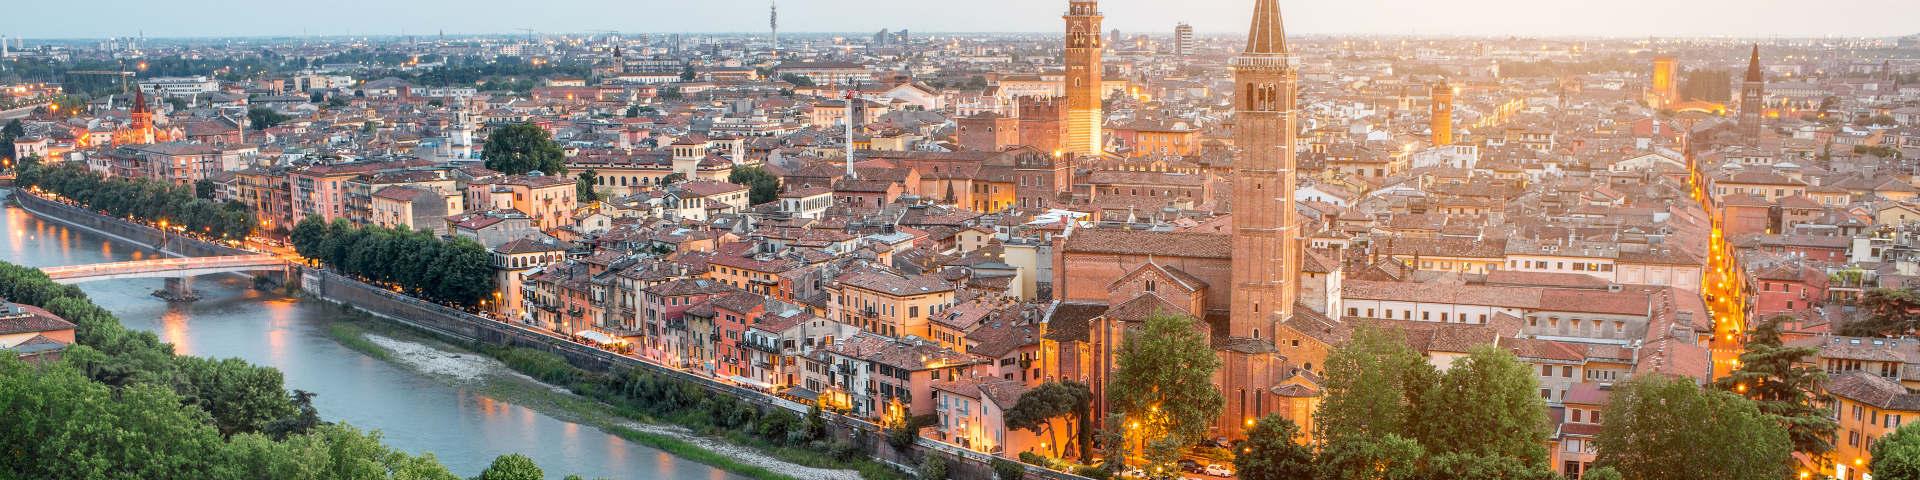 Verona hero banner 1